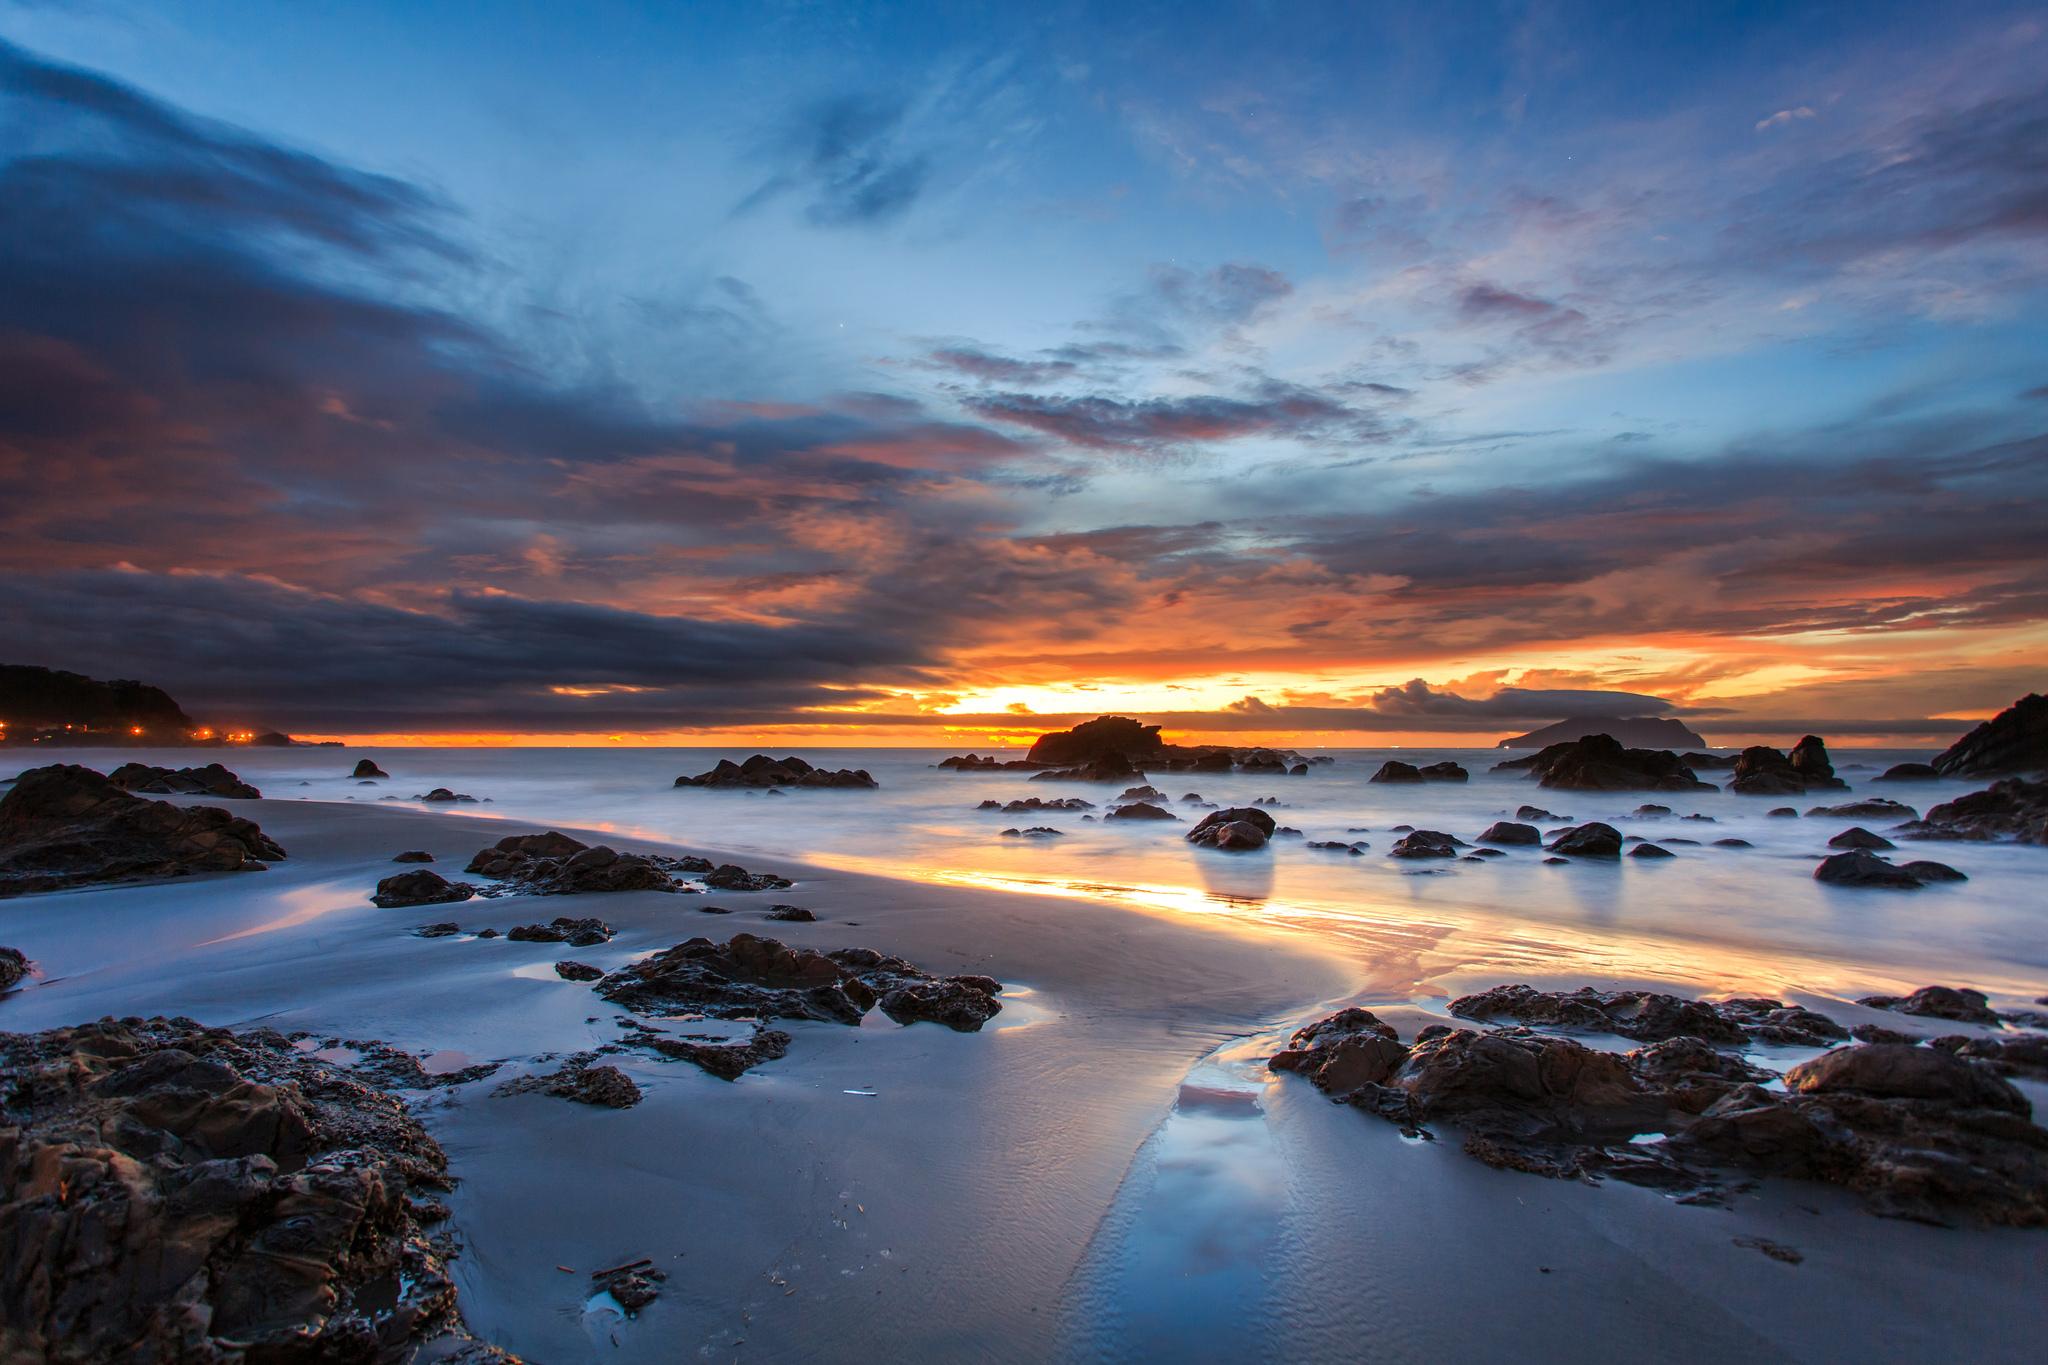 море океан камни скалы закат sea the ocean stones rock sunset  № 2530550 загрузить